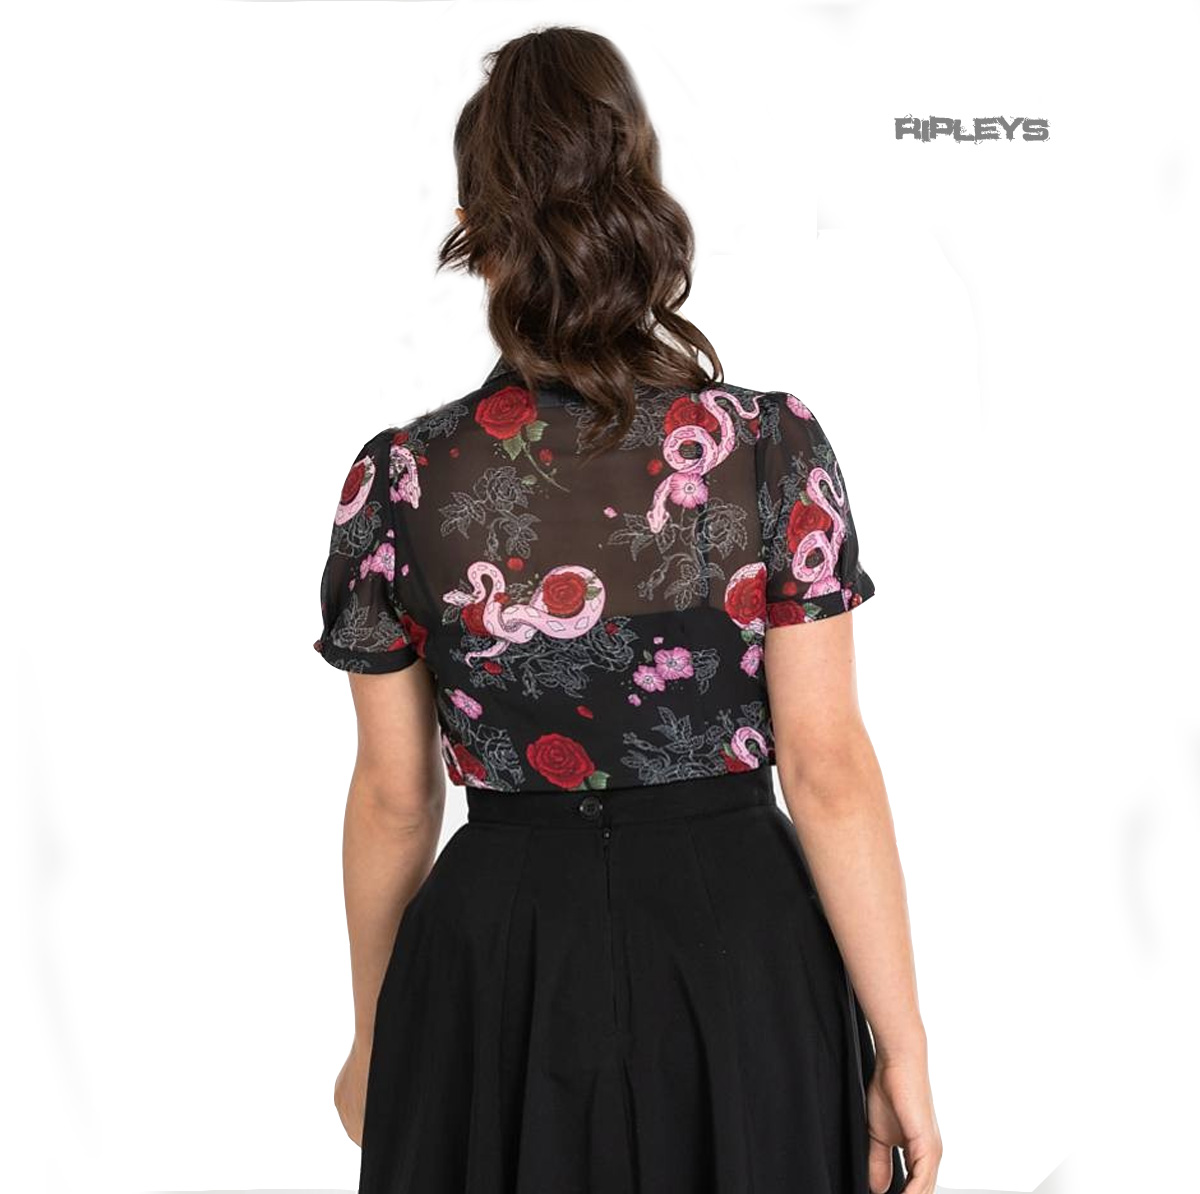 Hell-Bunny-Shirt-Gothic-Black-Top-MEDUSA-Blouse-Snakes-amp-Roses-All-Sizes thumbnail 4